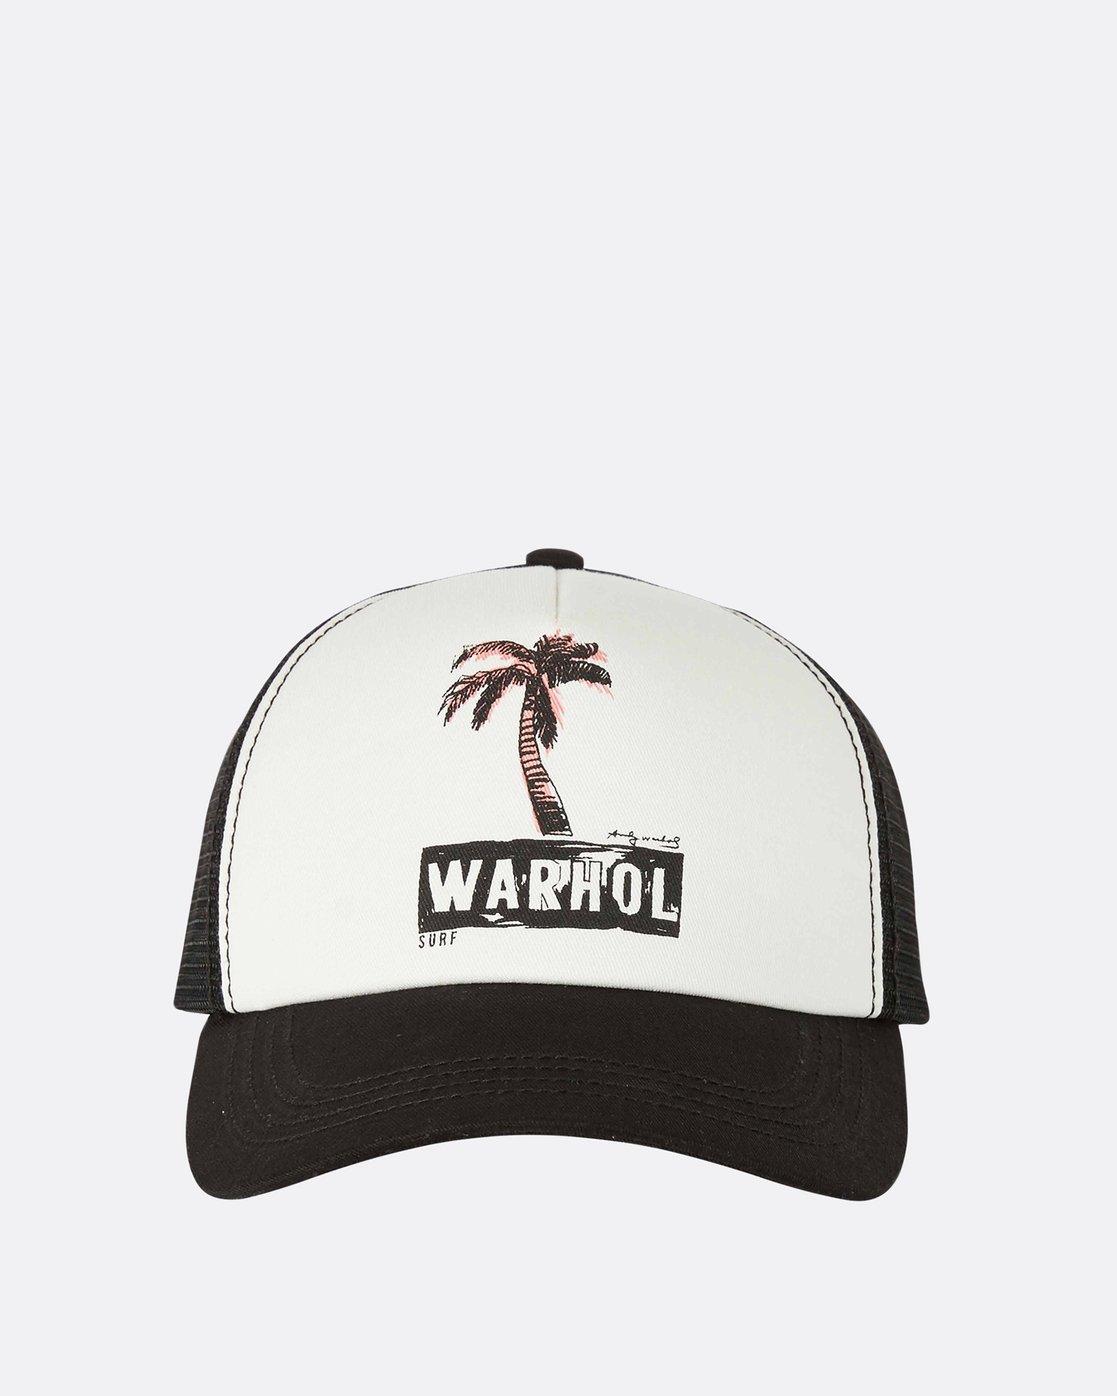 51155fa65c7707 1 Warholsurf Holly Trucker Hat JAHTLHOL Billabong